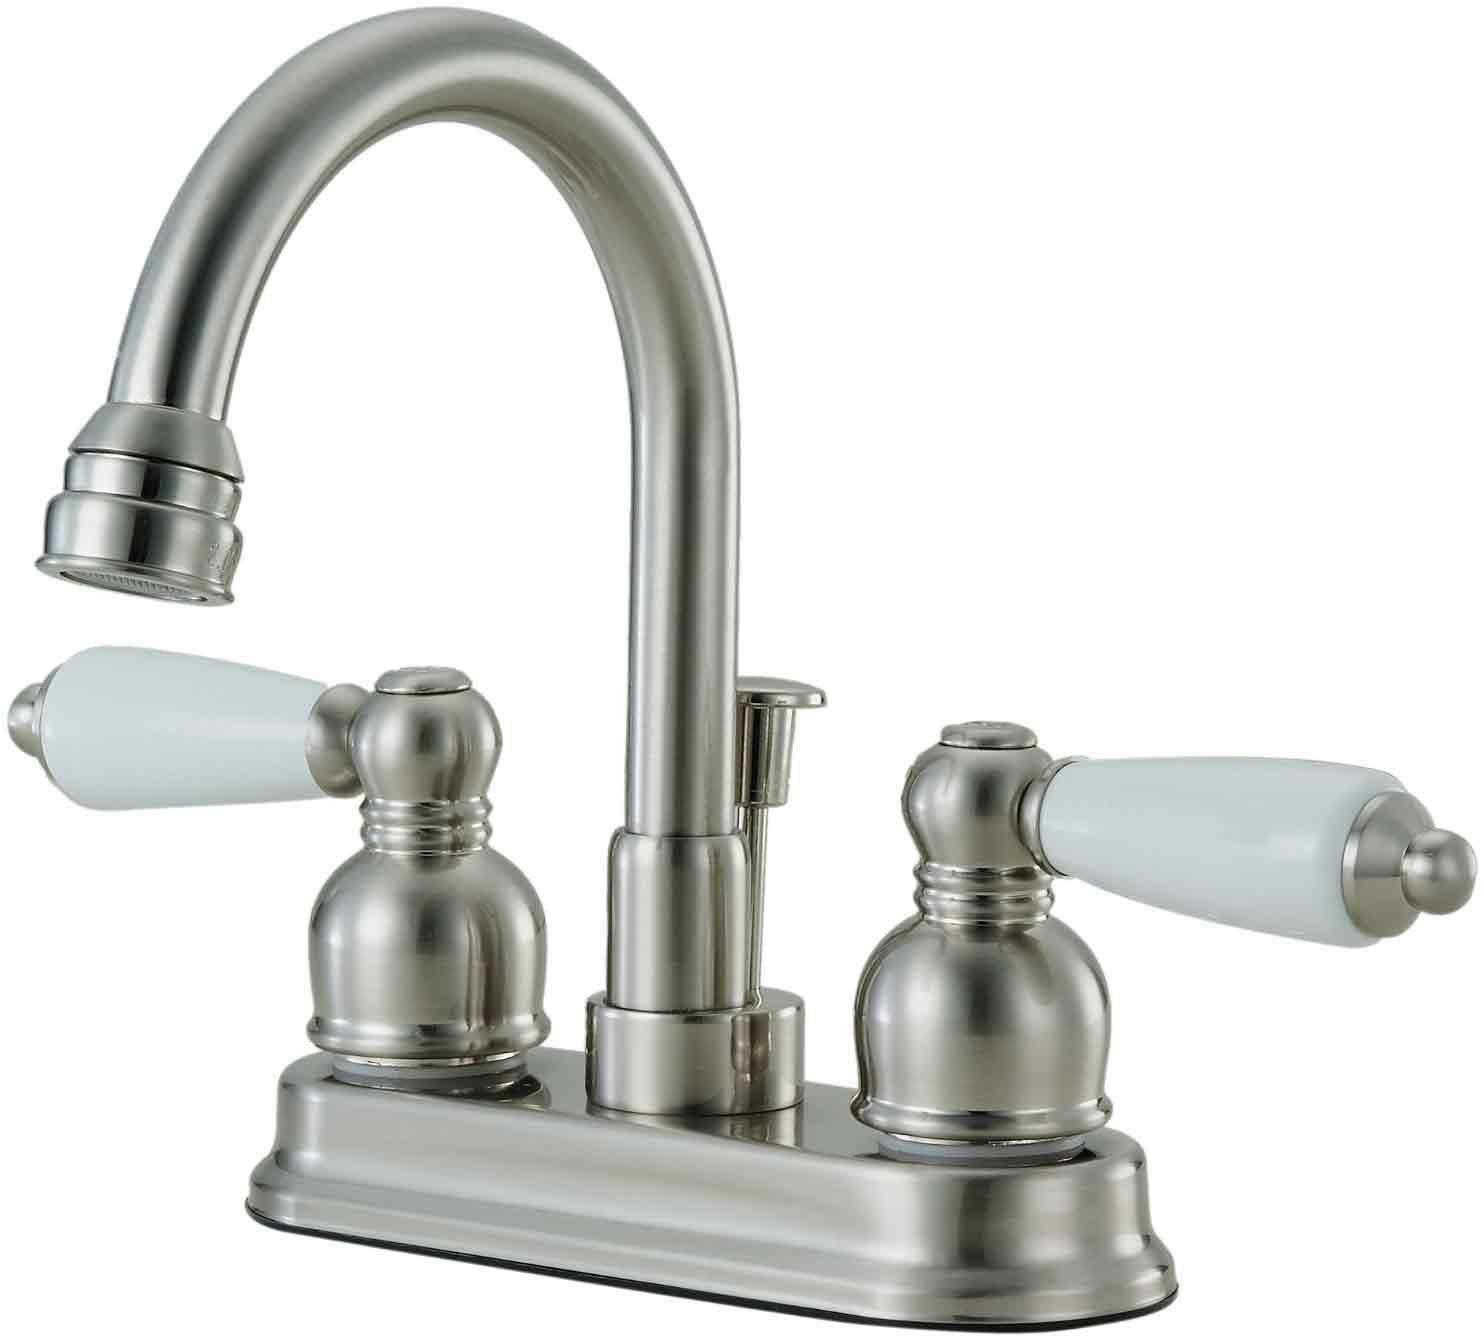 12-2832 Satin Nickel Lavatory/Bar Faucet